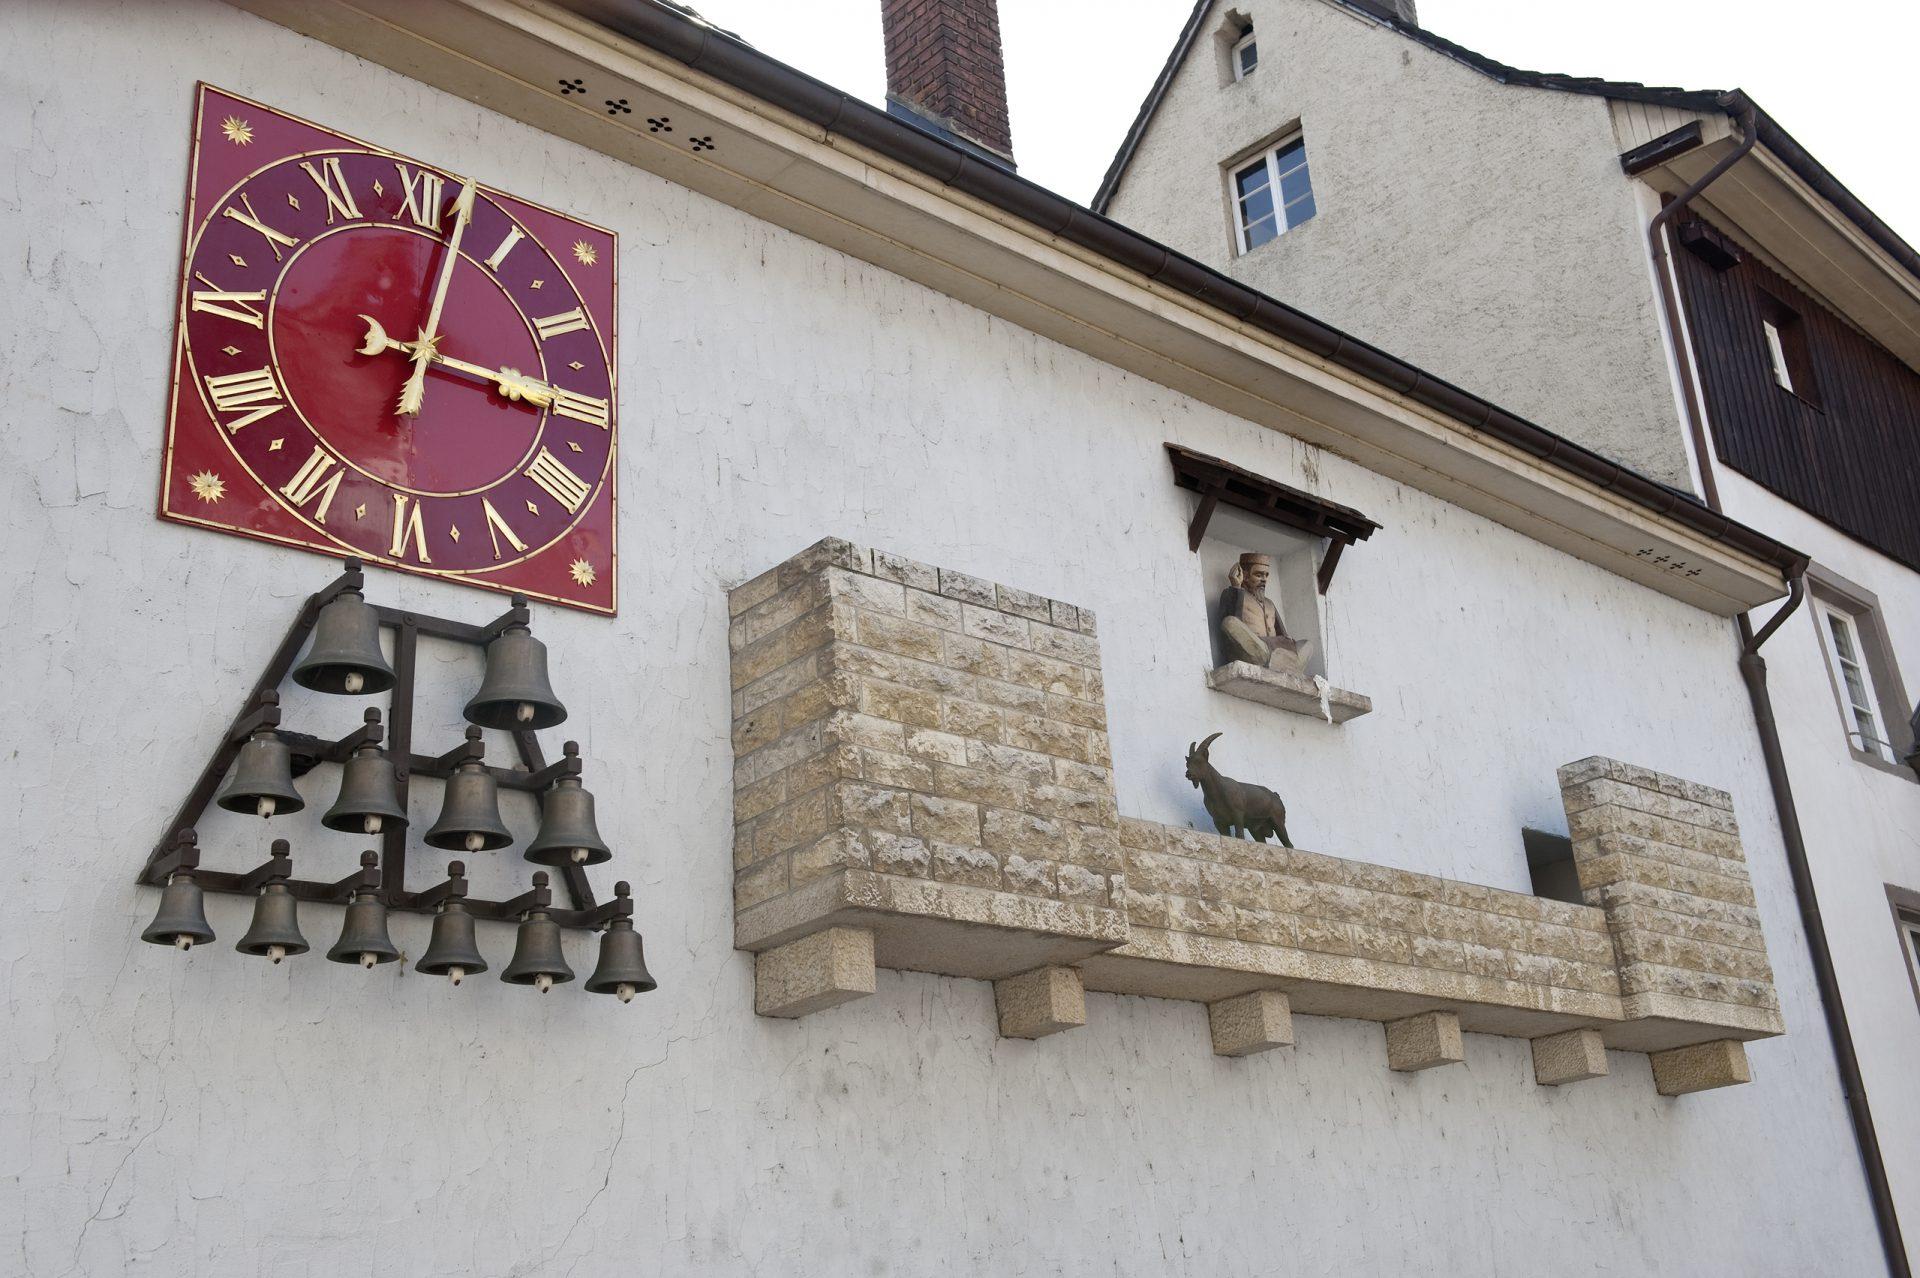 Glockenspiel_Rumpel_Rheinfelden